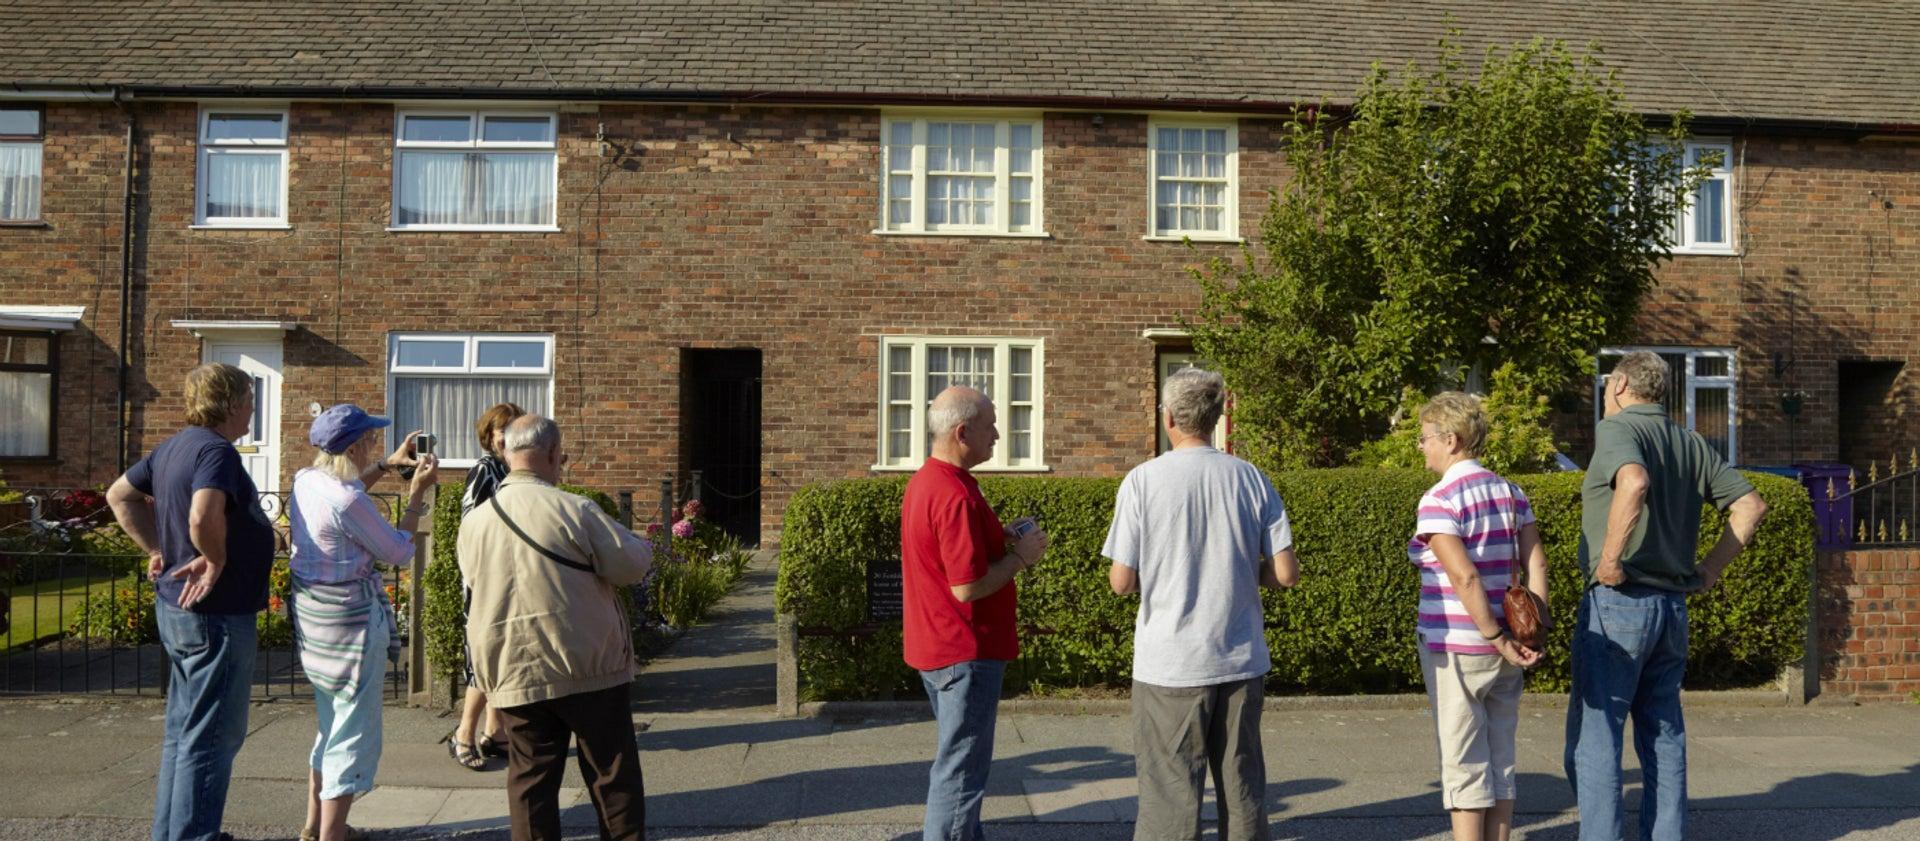 Beatles' Childhood Homes Tour - Jurys Inn pickup - April 2020